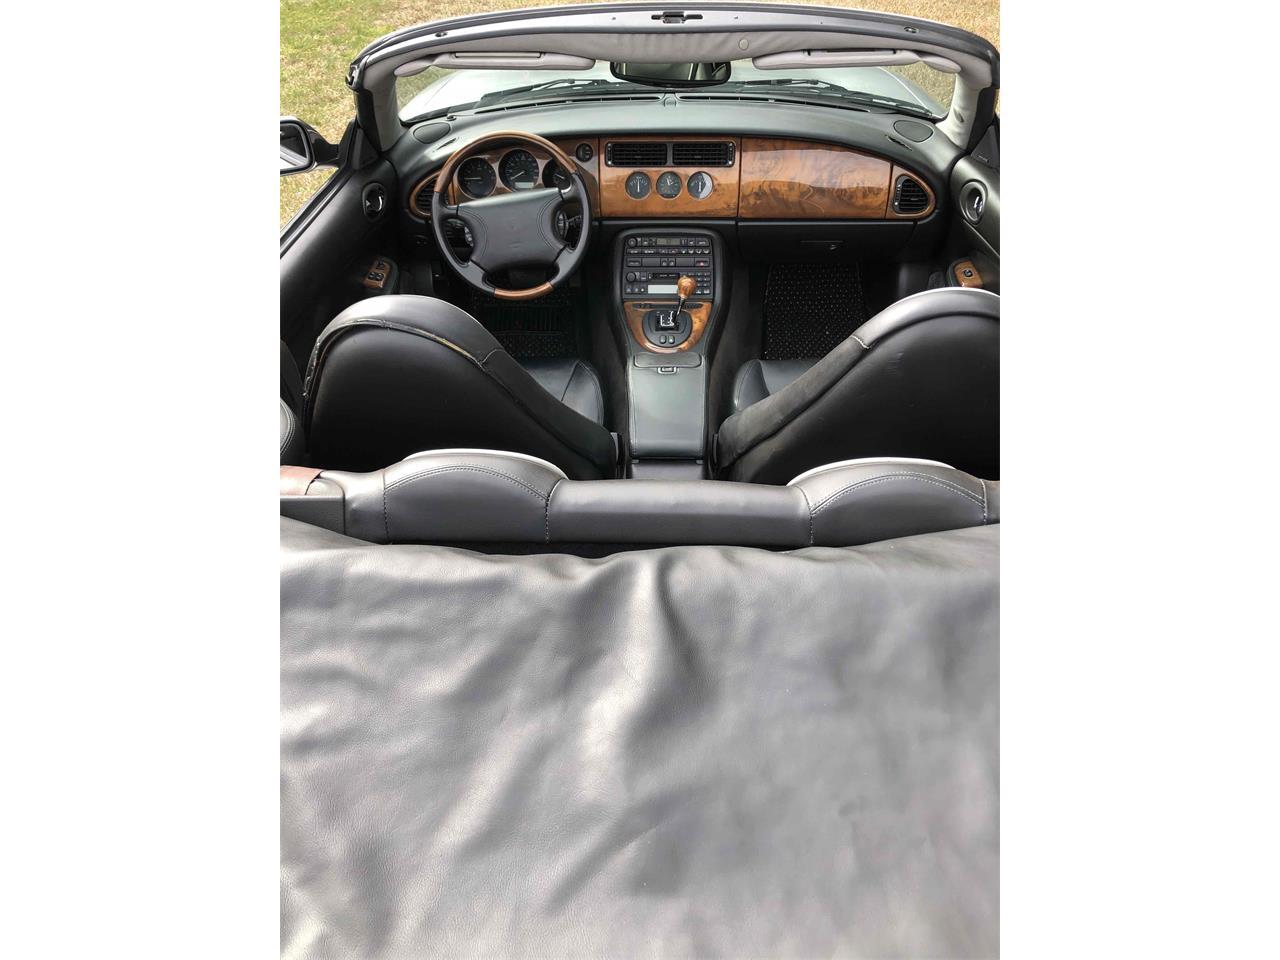 2000 Jaguar XK8 (CC-1353345) for sale in Morrisville, North Carolina